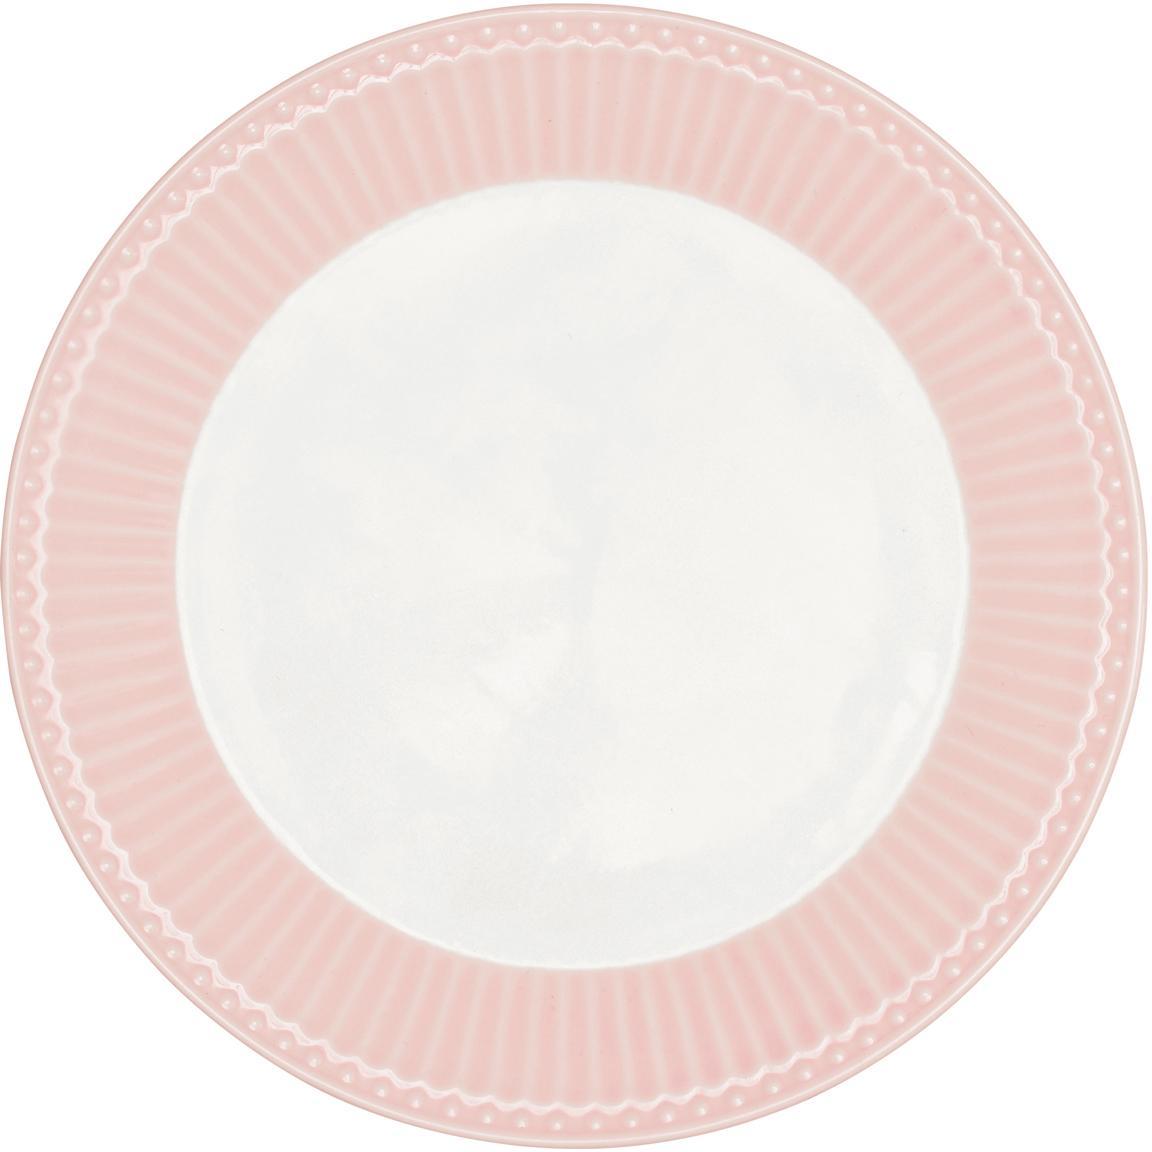 Piattino da dessert Alice 2 pz, Porcellana, Rosa, bianco, Ø 23 cm